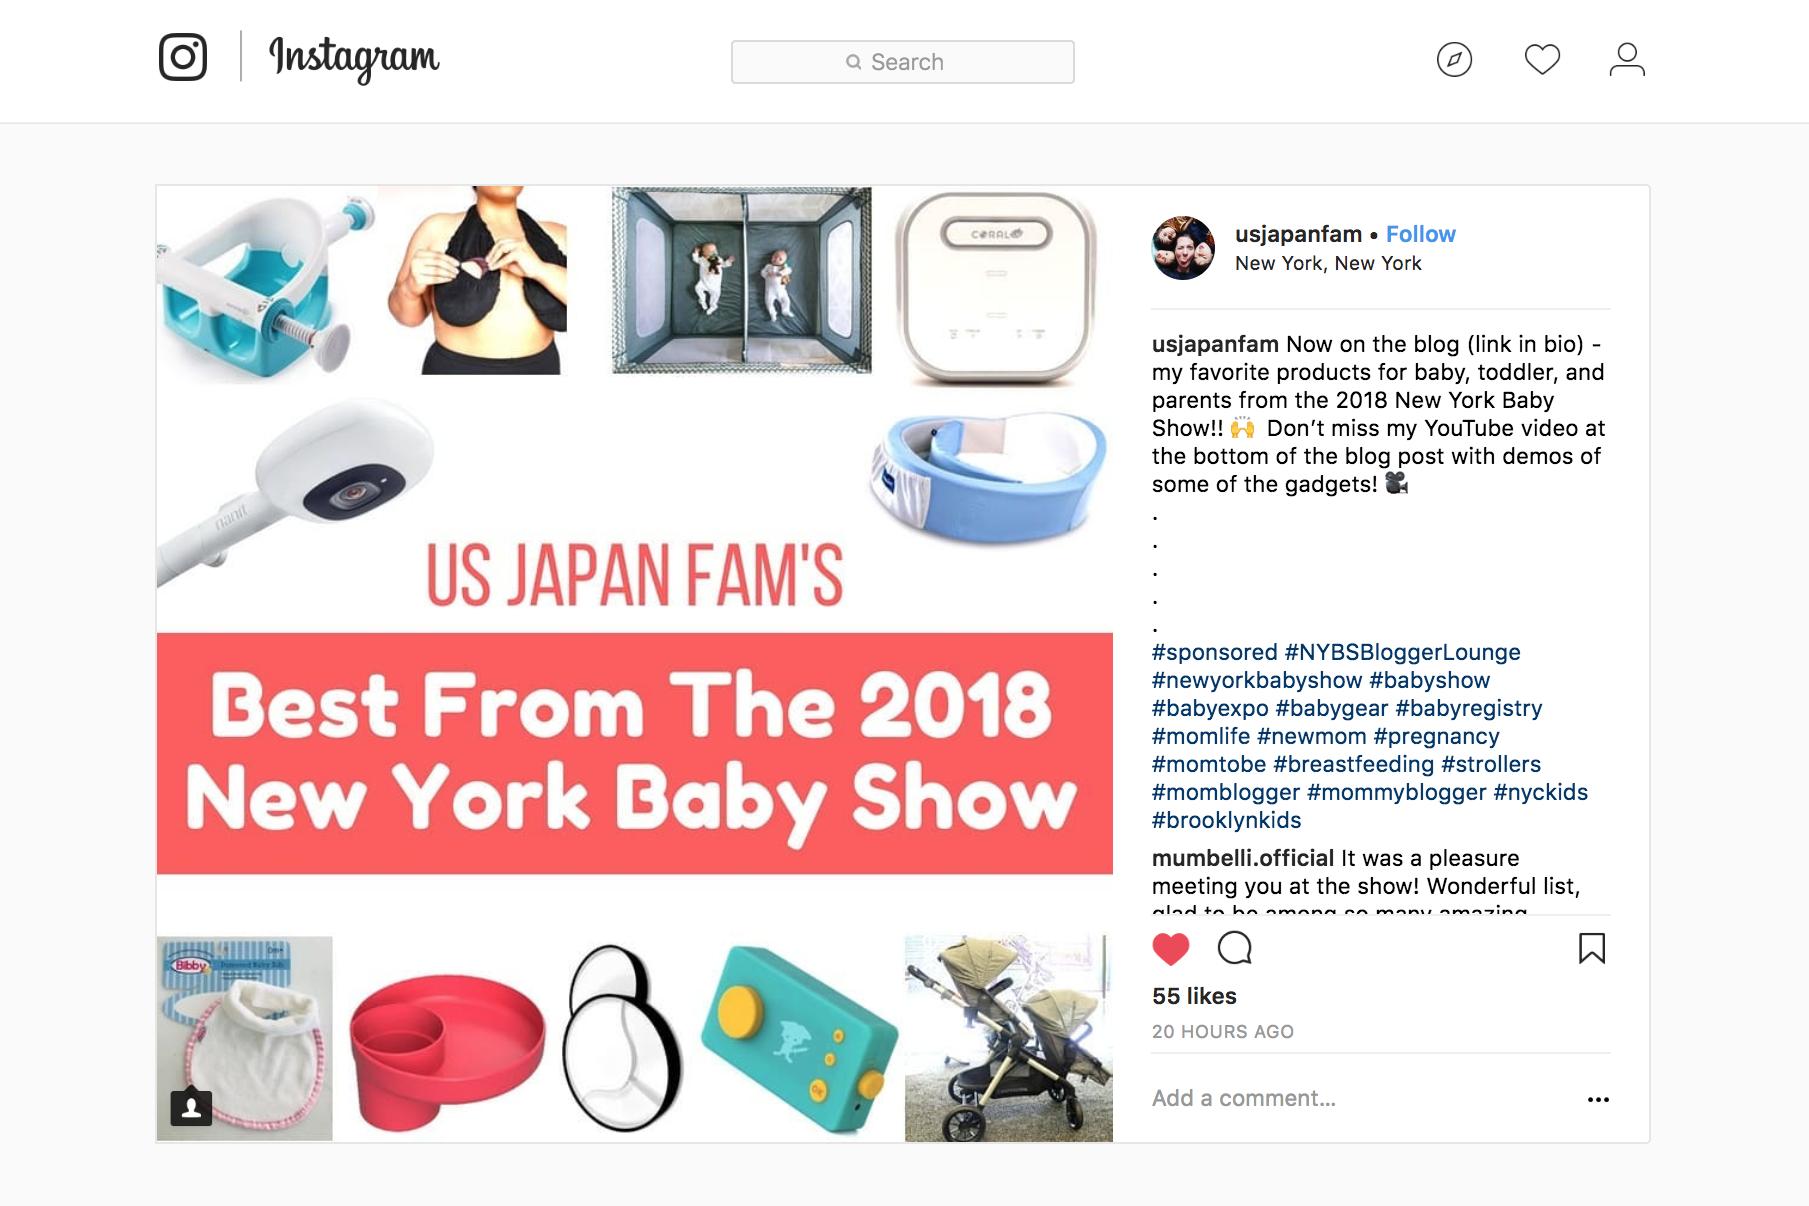 2018.05.25_US Japan Fam, Instagram_Summer Infant My Bath Seat_original, cropped 3x2.png